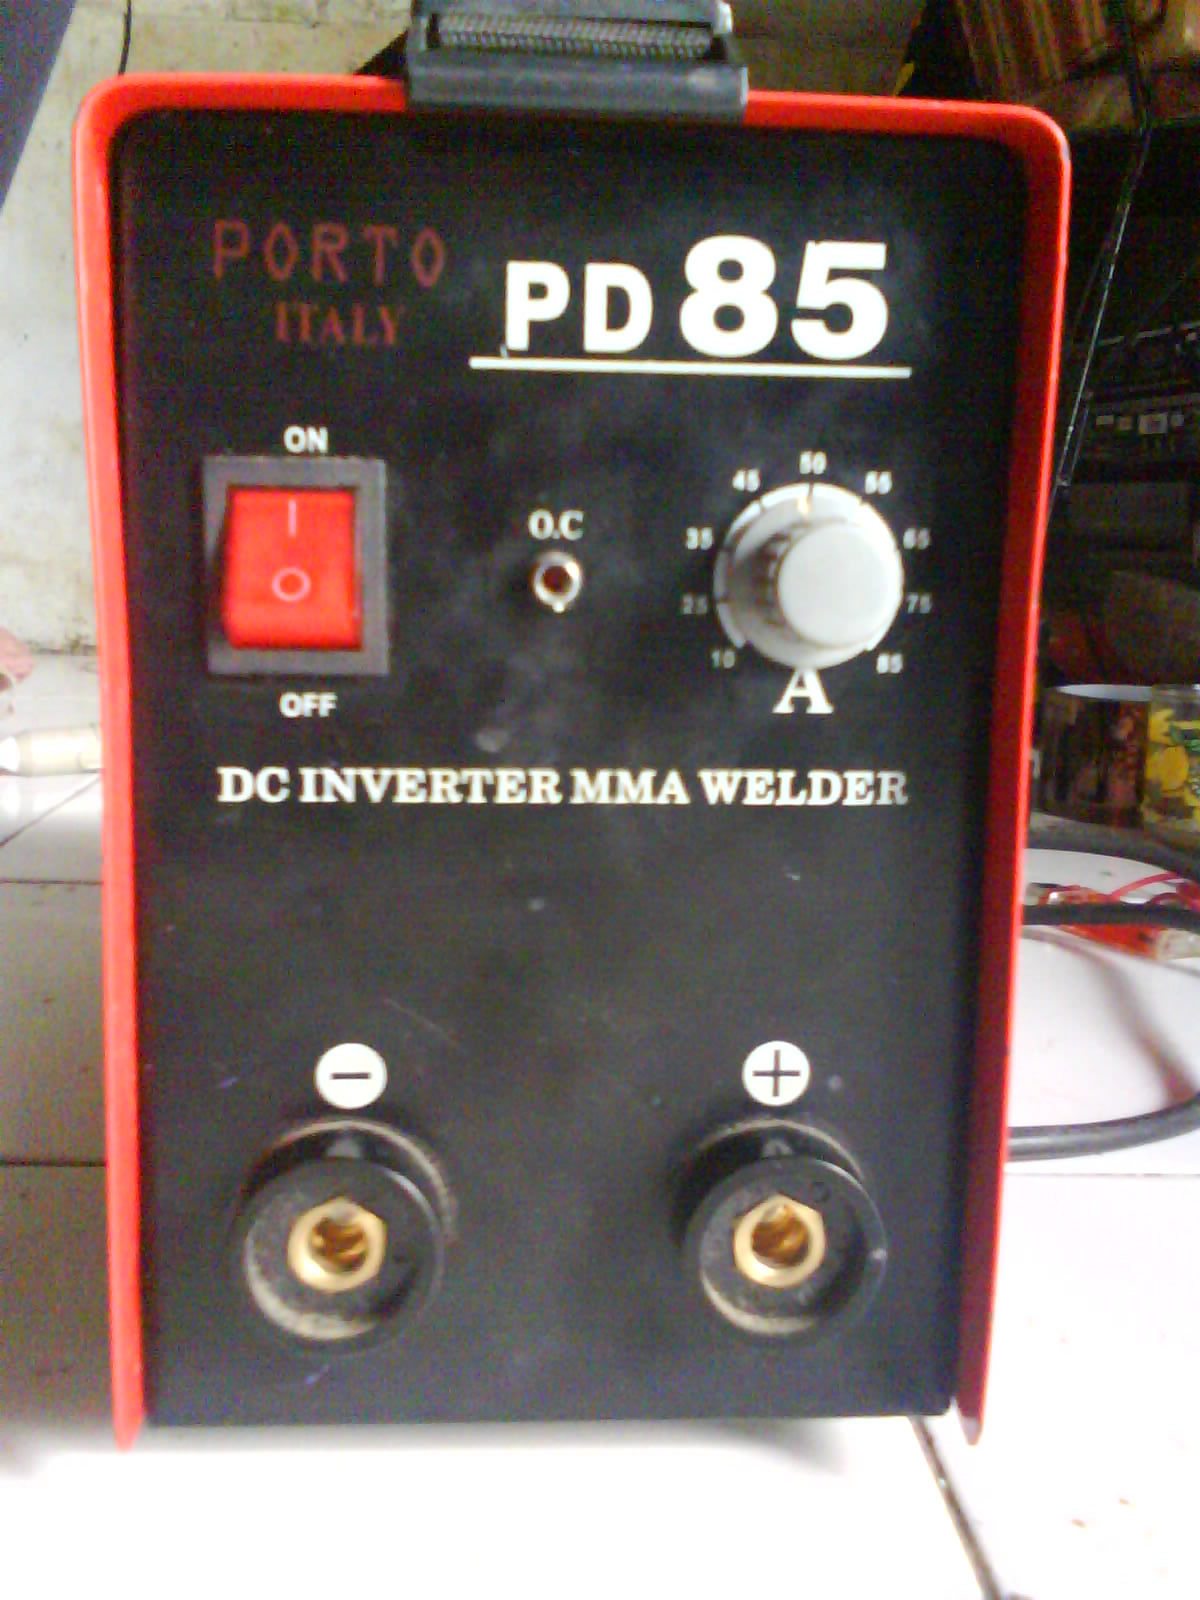 Hobi elektronika perbaiki mesin las porto pd85 seorang kawan lama membawa mesin las listrik merk porto pd85 kepada saya untuk diperbaiki kerusakannya lampu indikator protek kalau boleh saya bilang asfbconference2016 Gallery